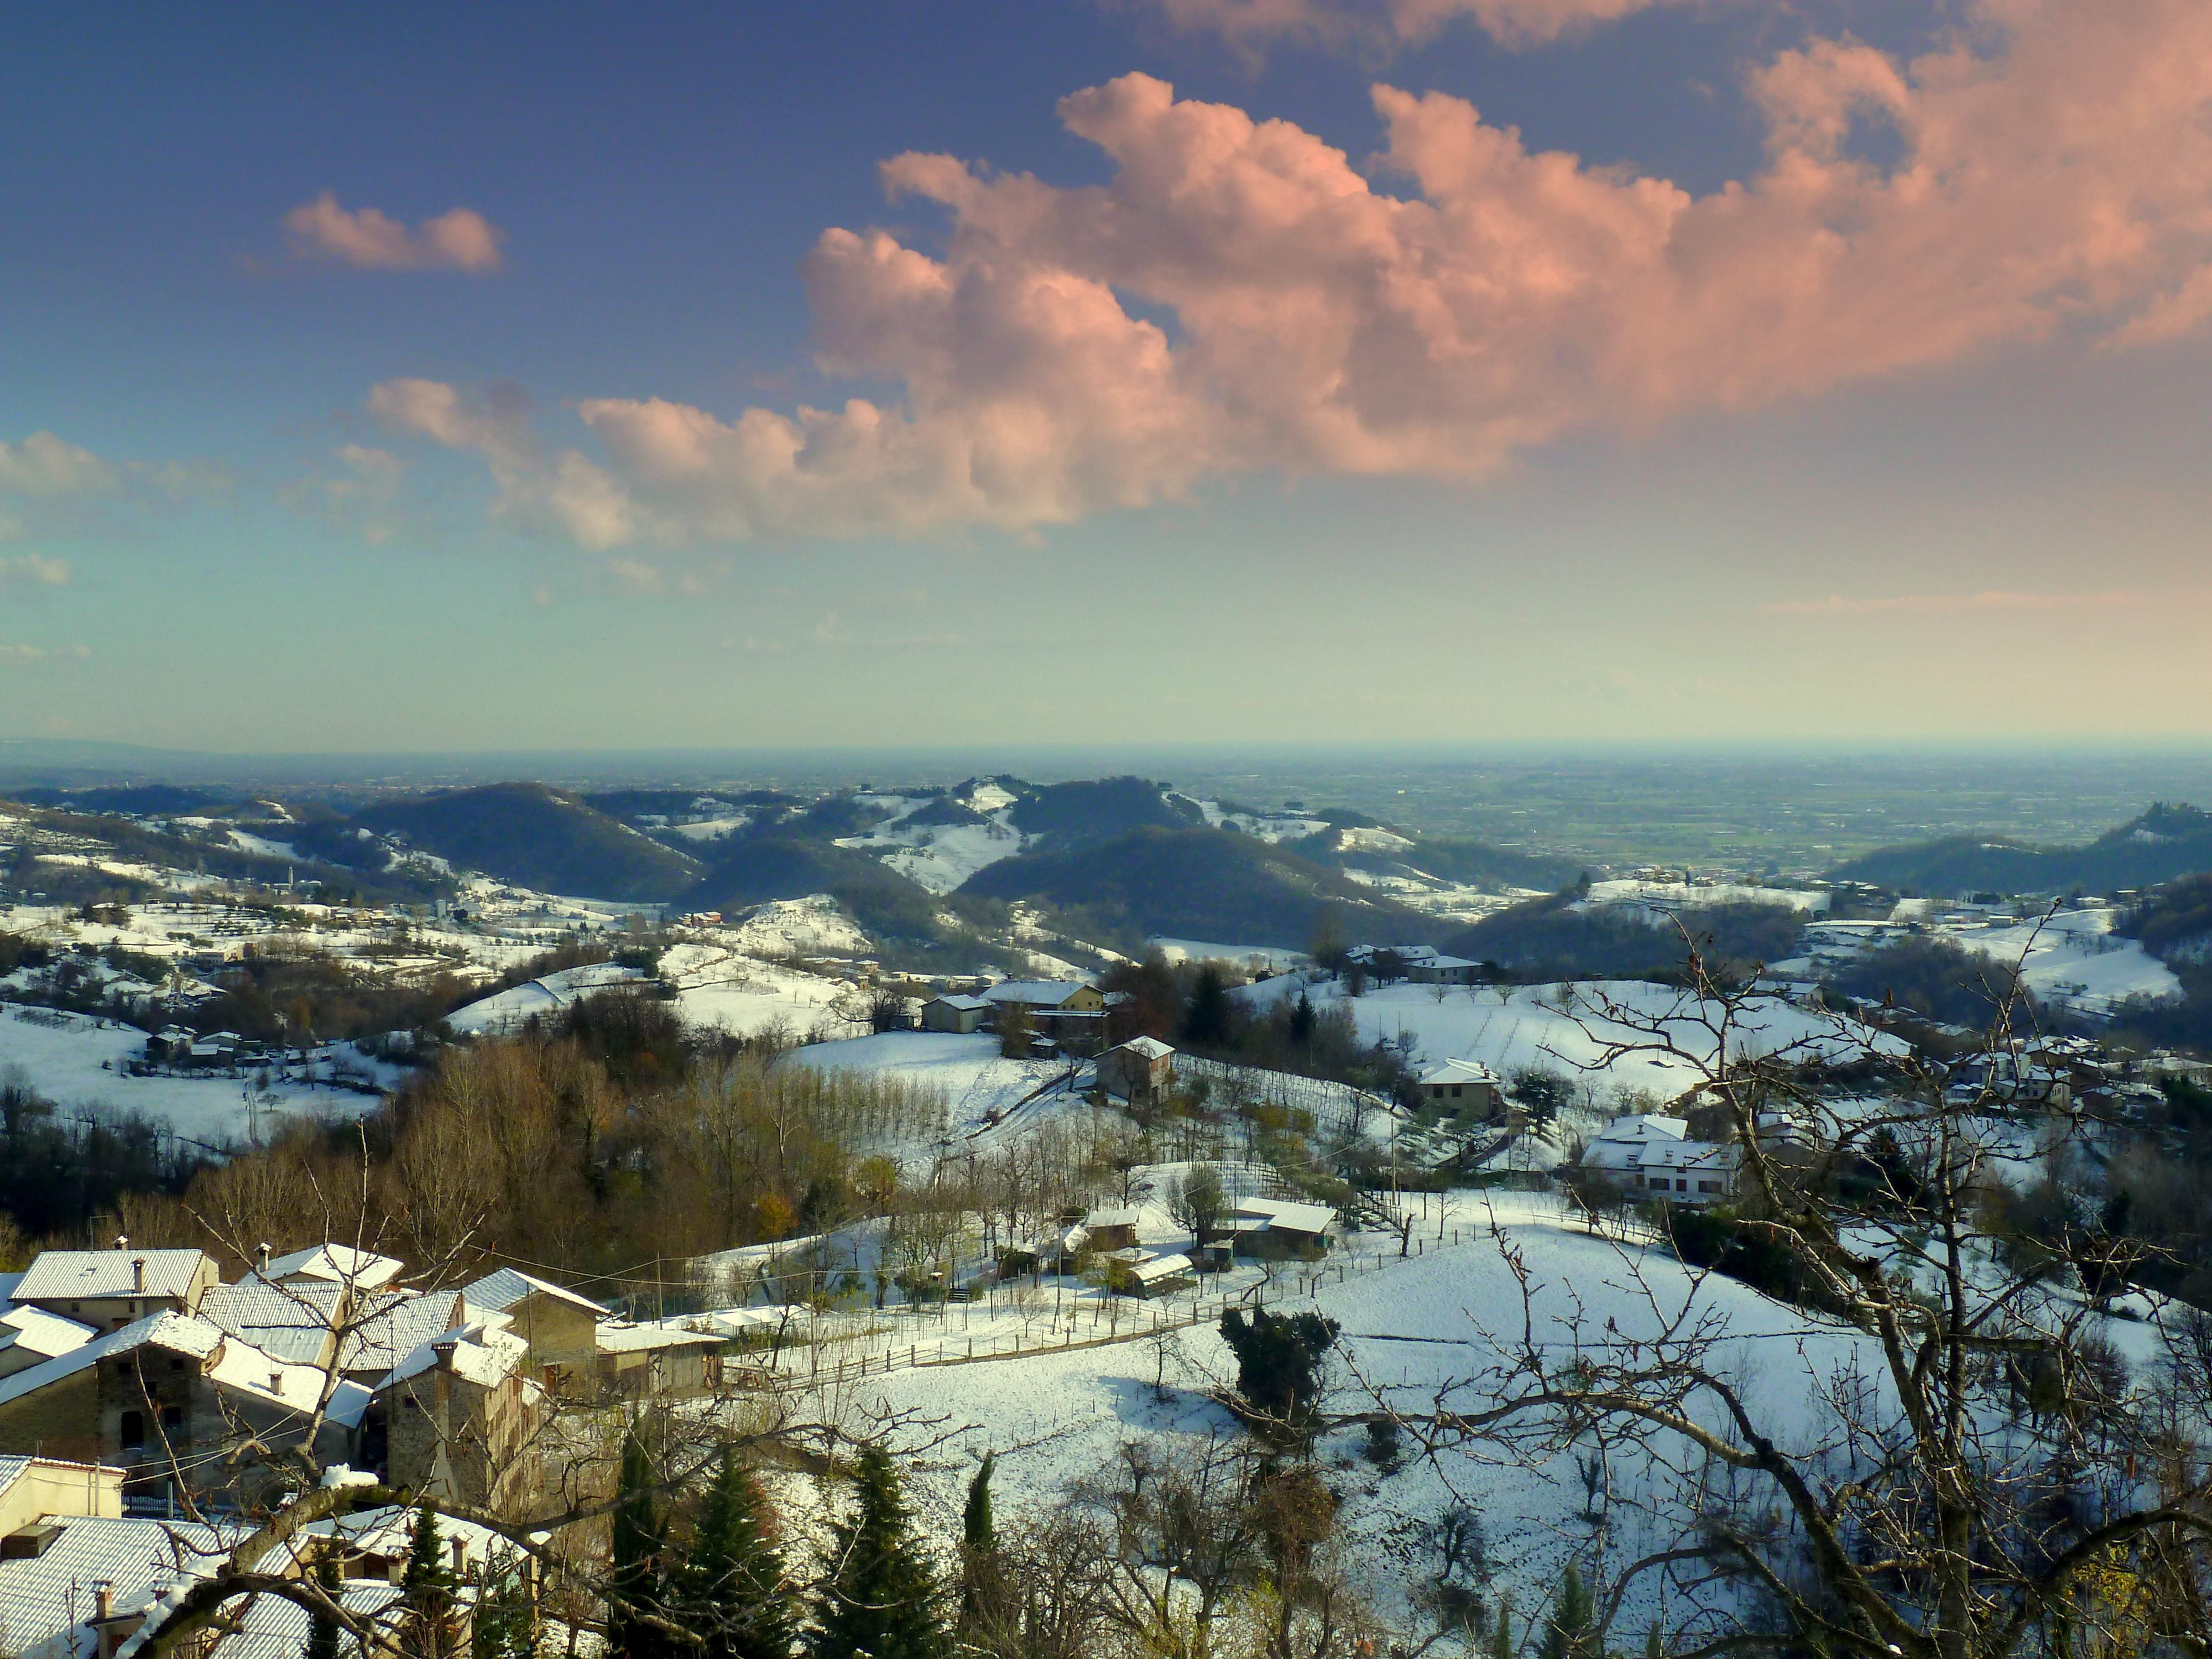 Elevation of Foza, Province of Vicenza, Italy ...